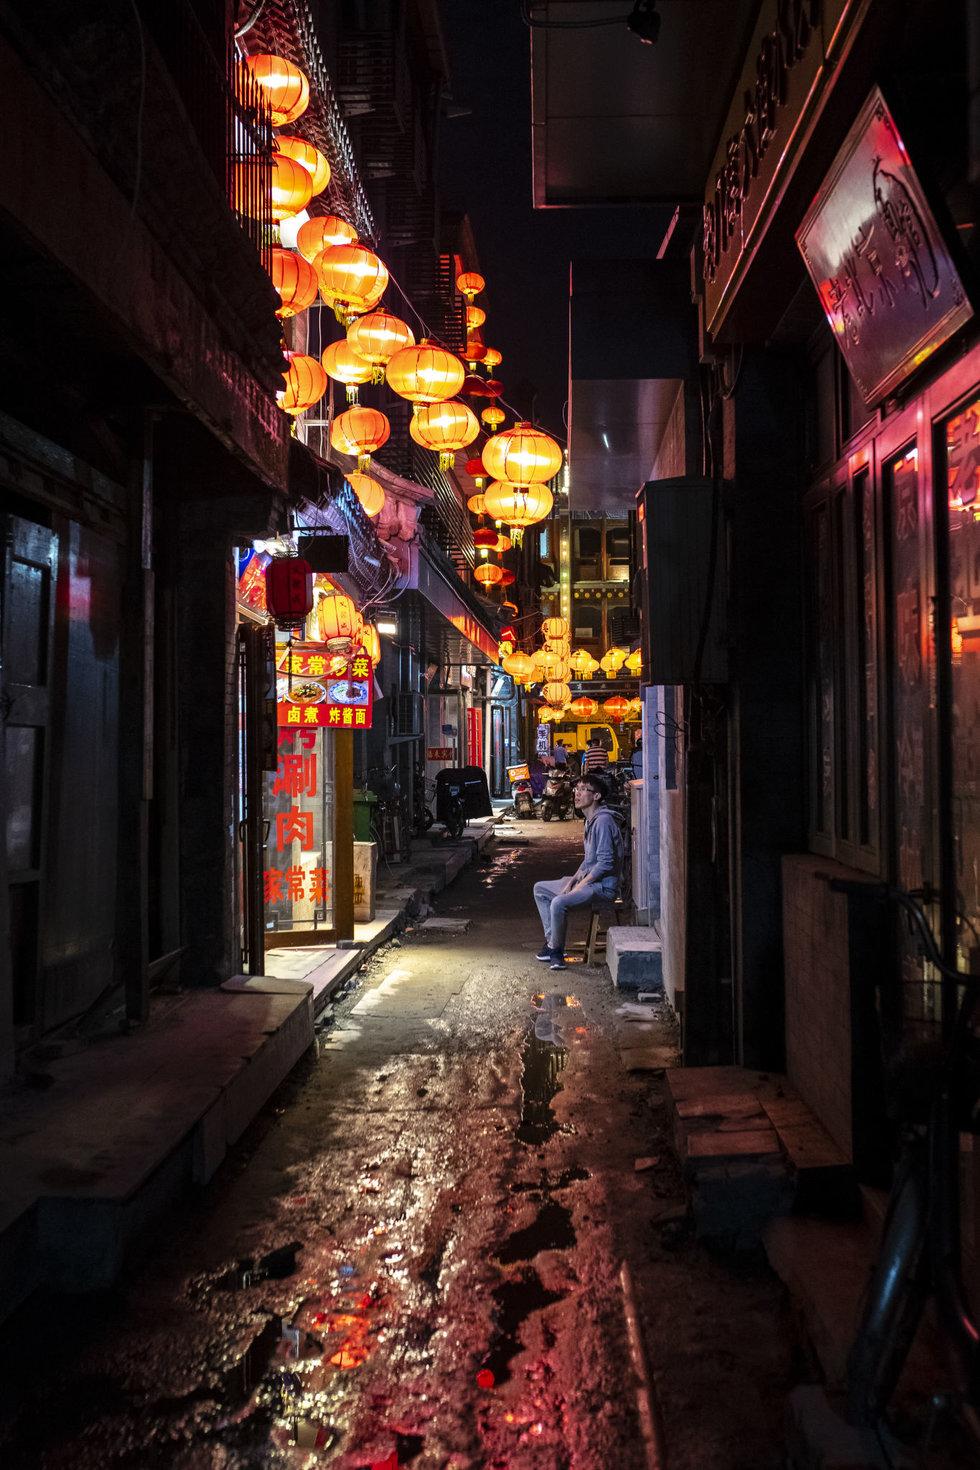 A lantern-filled back alley